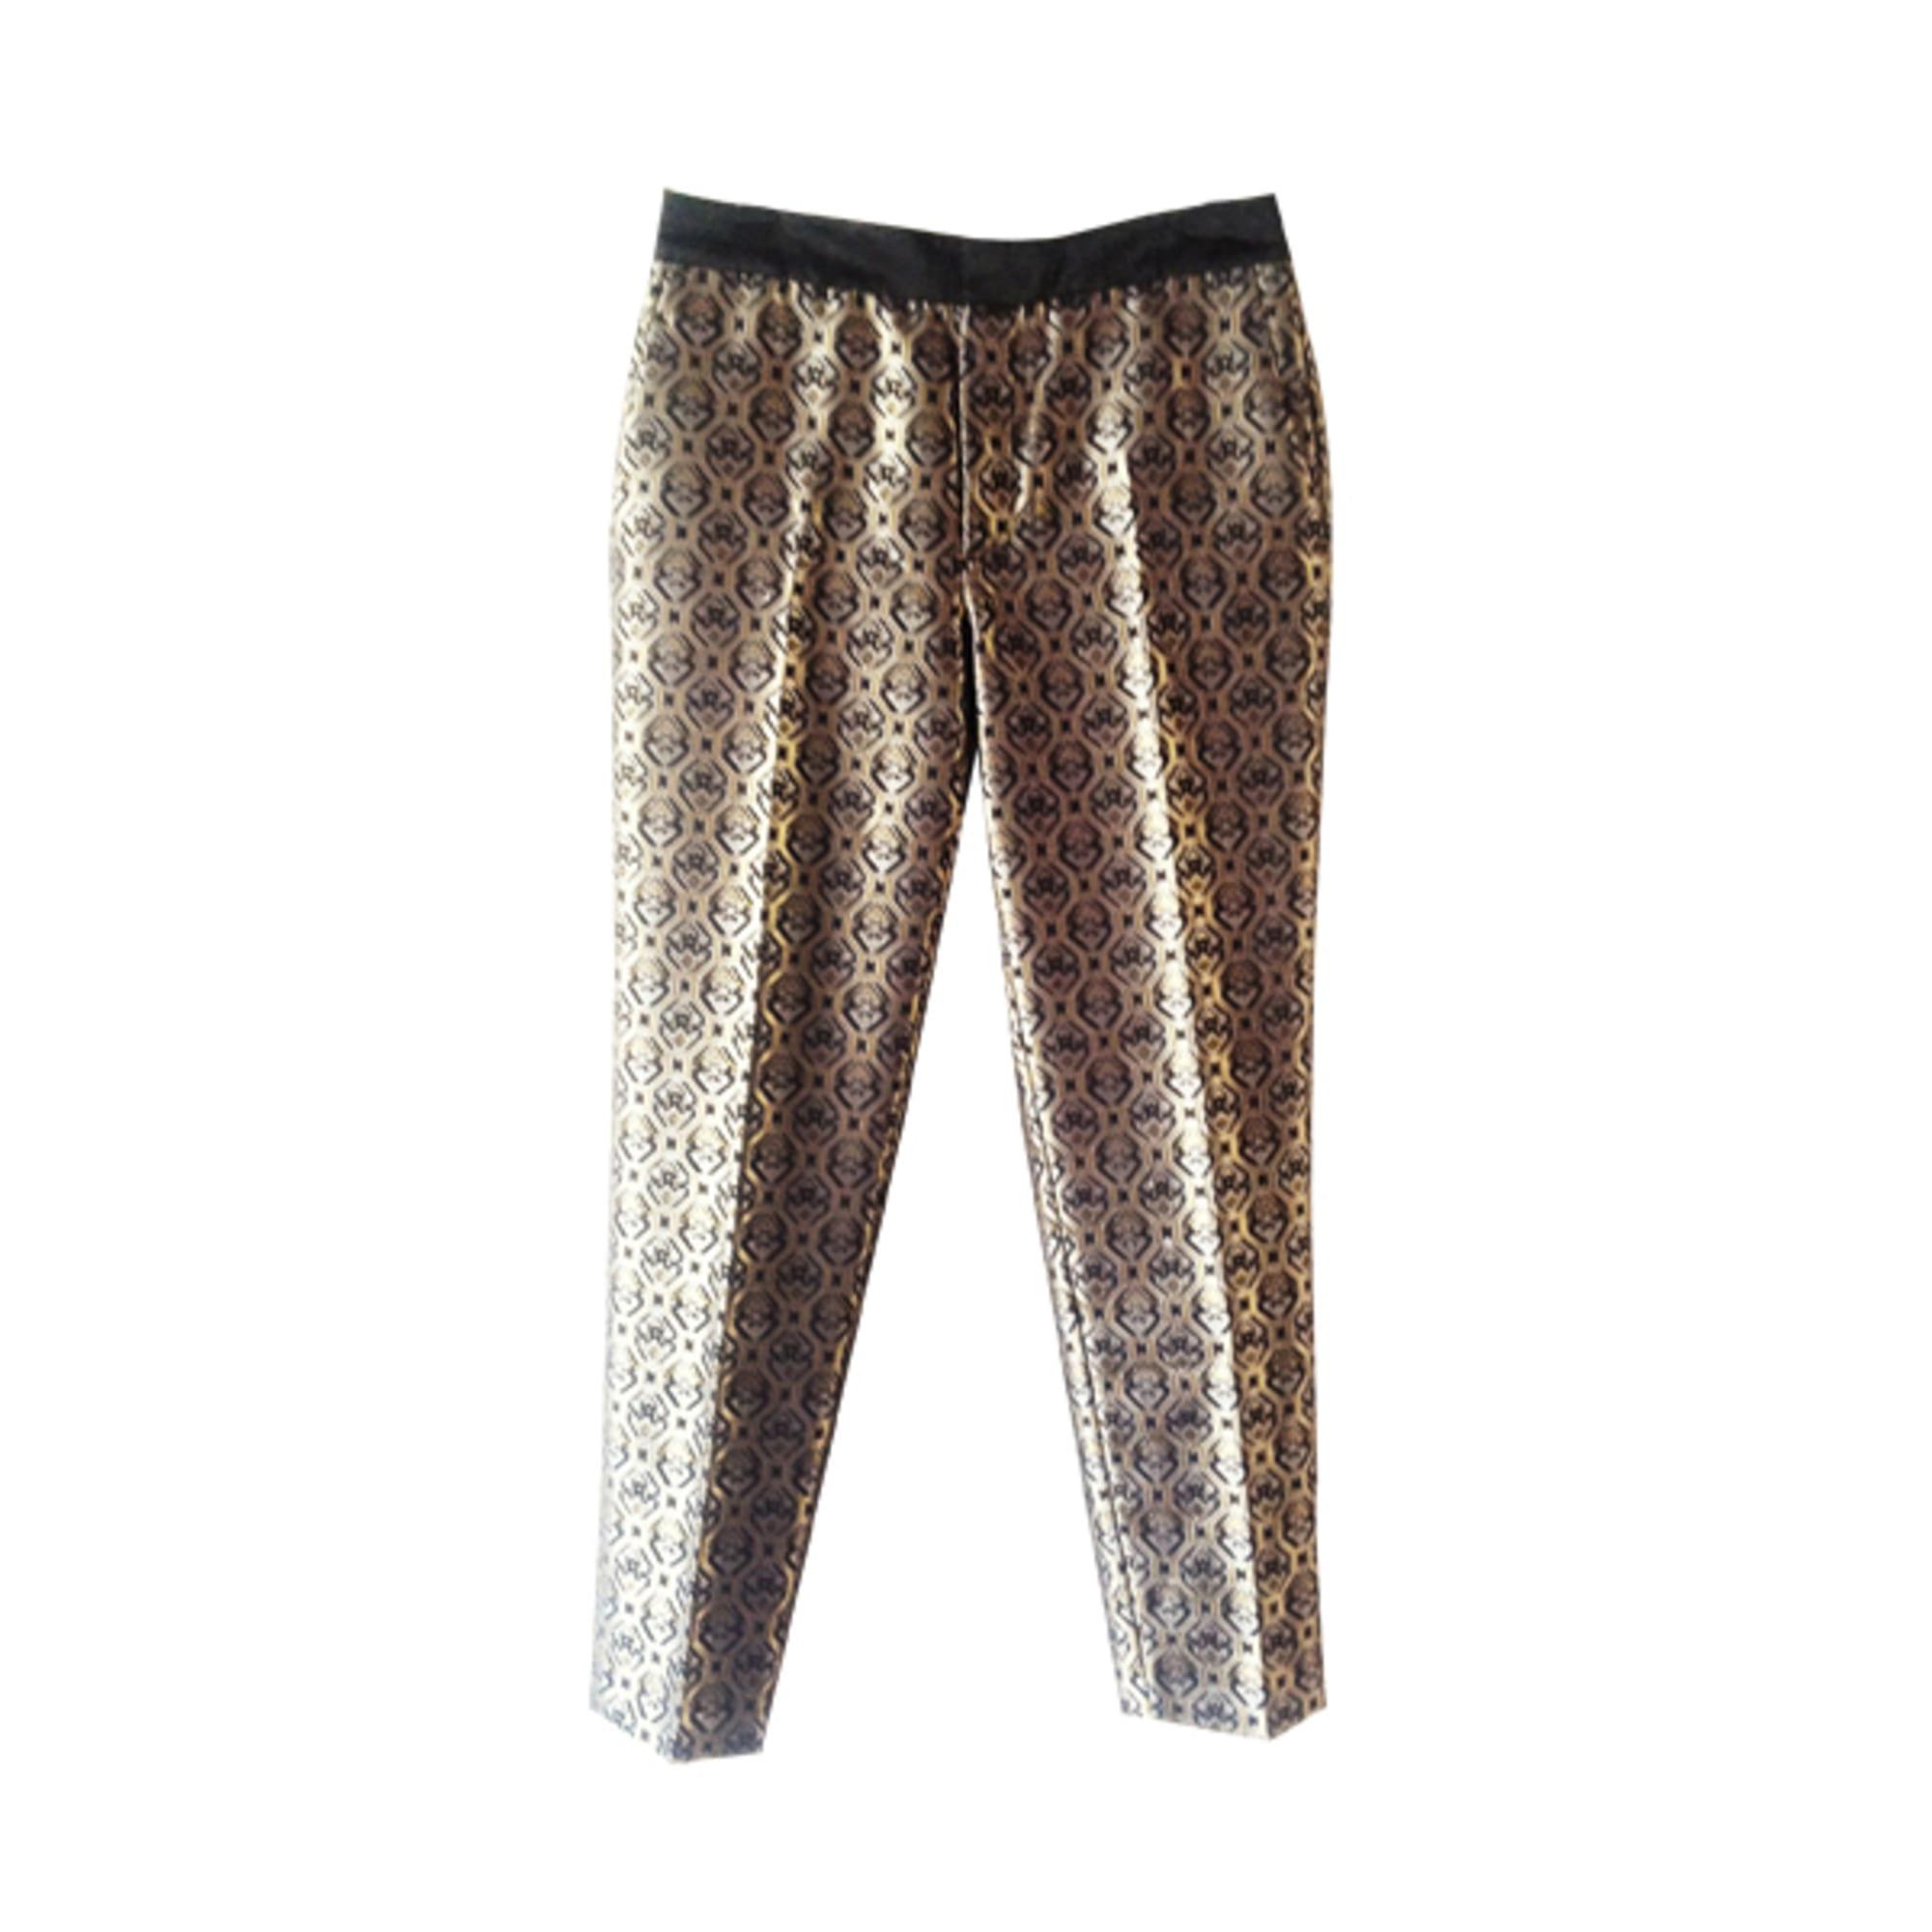 pantalon doré femme zara